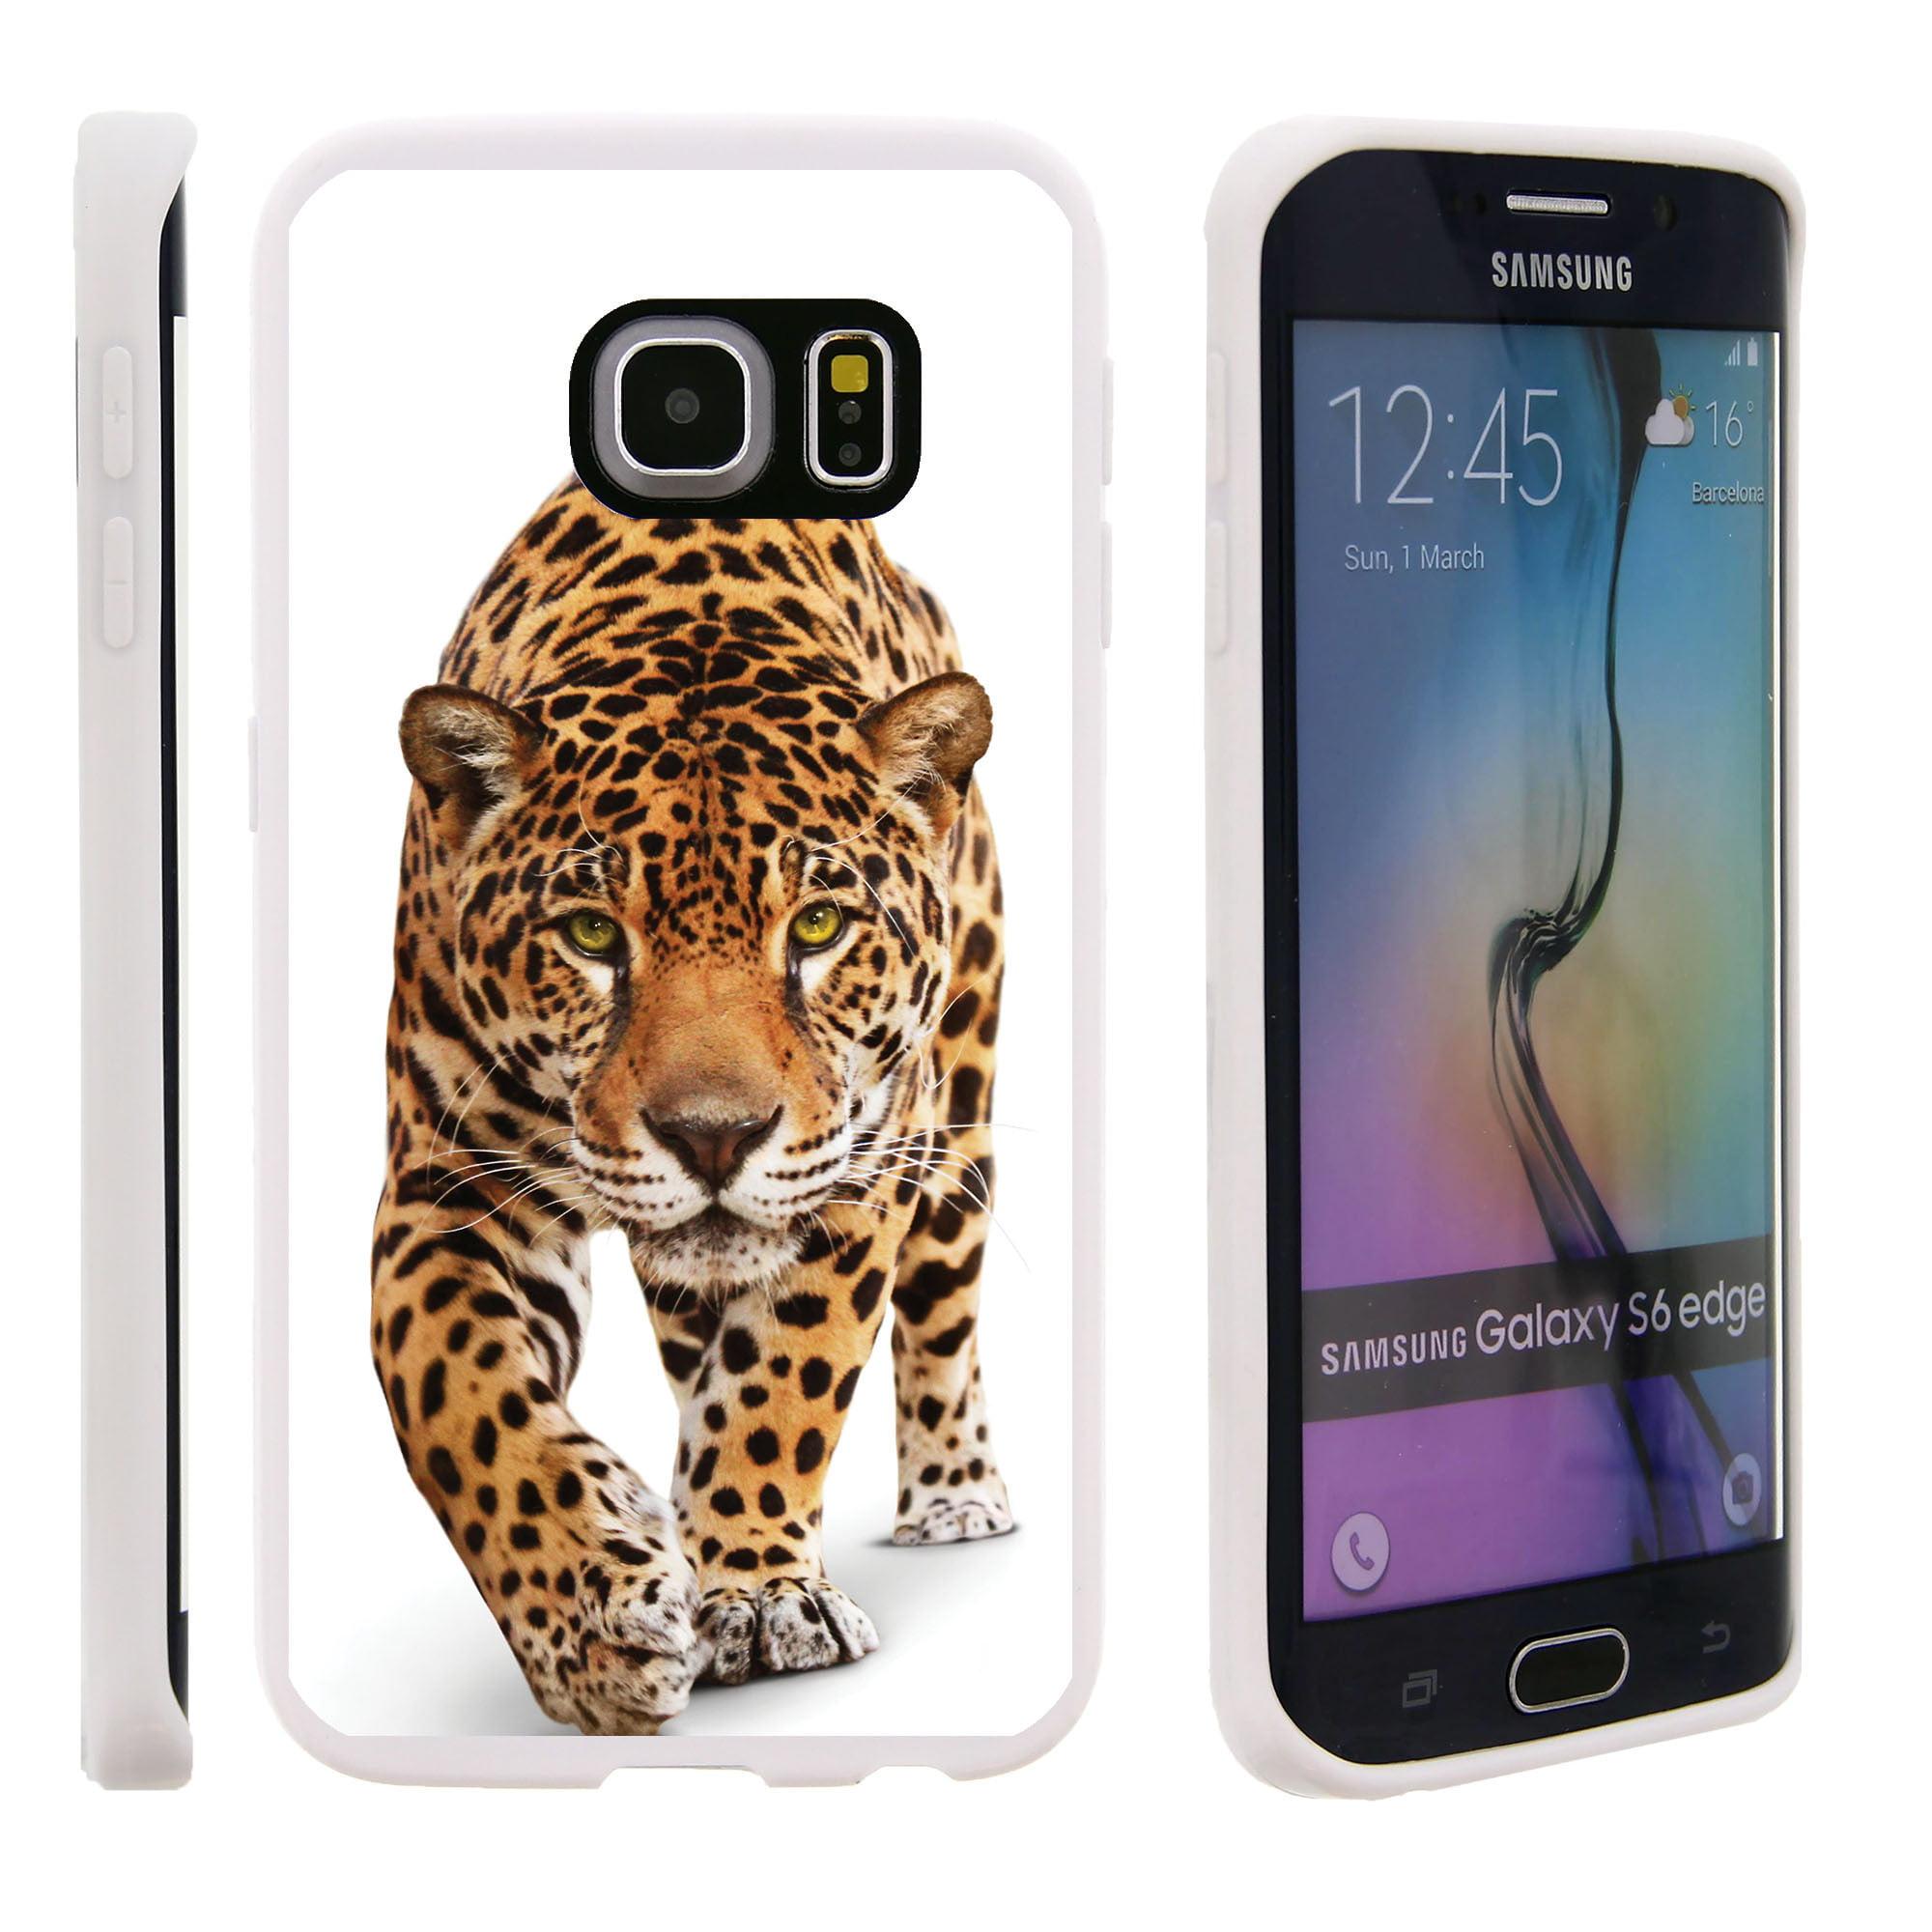 Samsung Galaxy S6 Edge G925, Flexible Case [FLEX FORCE] Slim Durable TPU Sleek Bumper with Unique Designs - Cheetah Walking